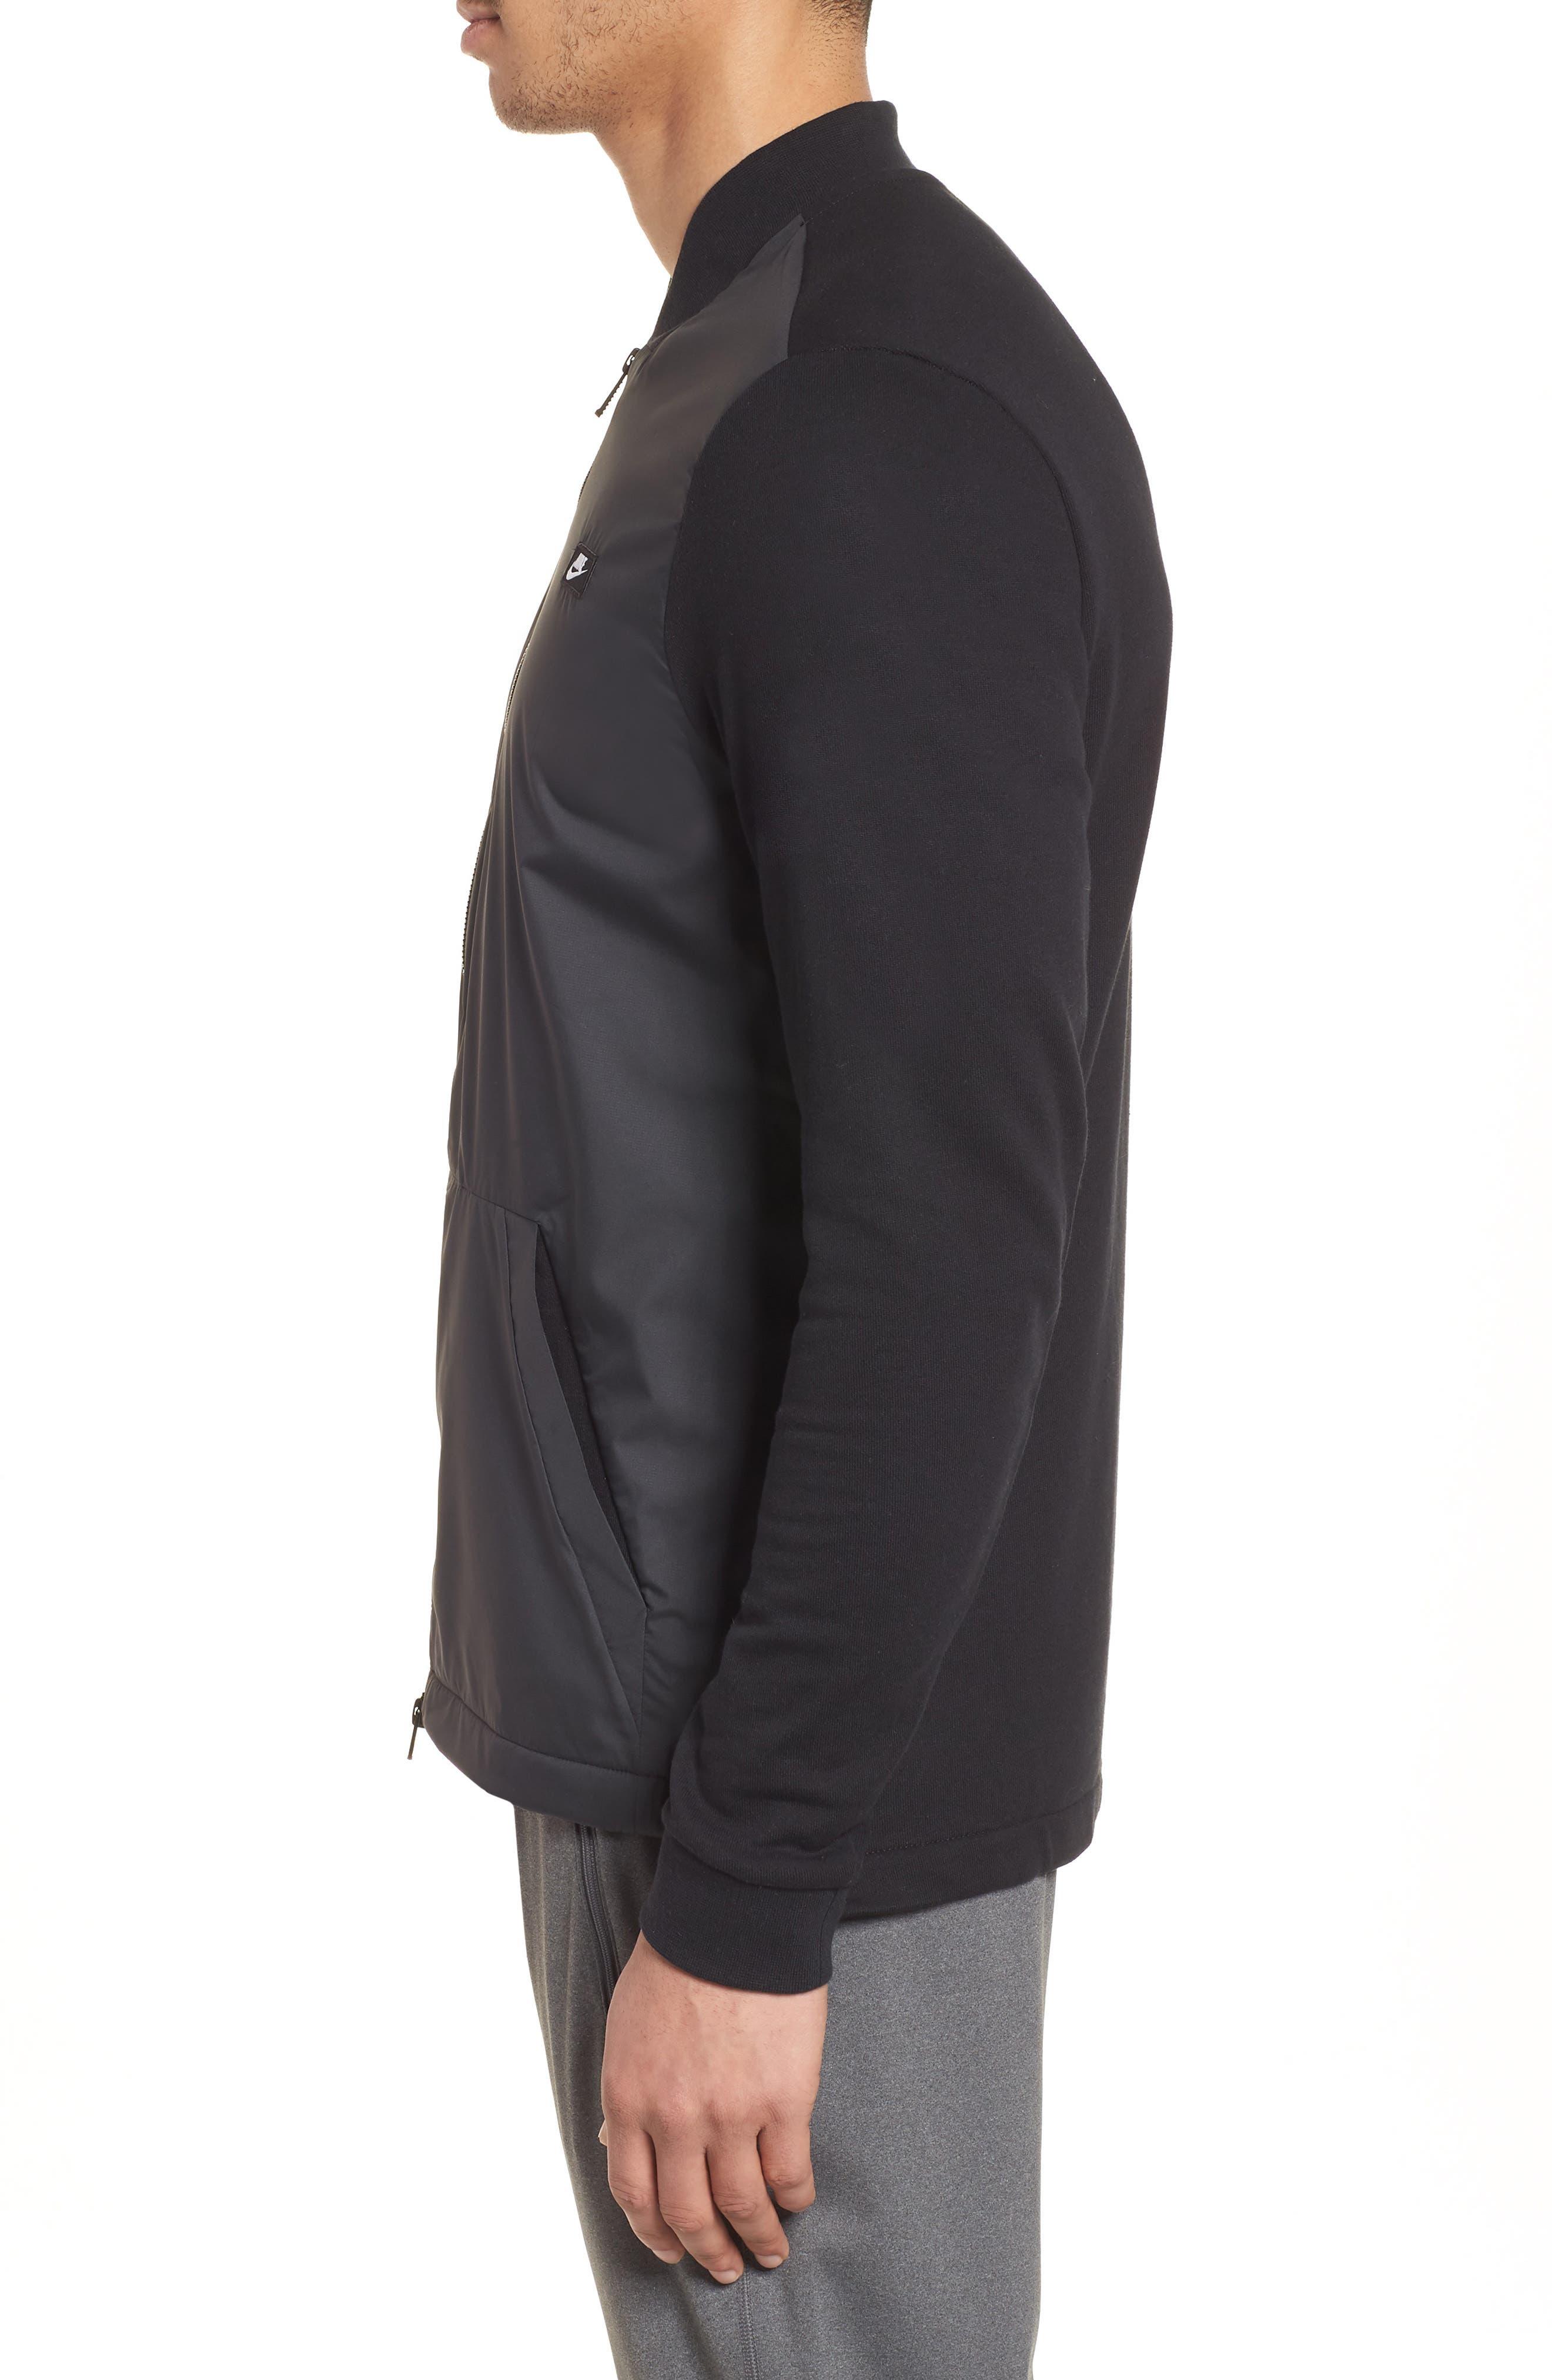 NSW Modern Track Jacket,                             Alternate thumbnail 4, color,                             Black/ Black